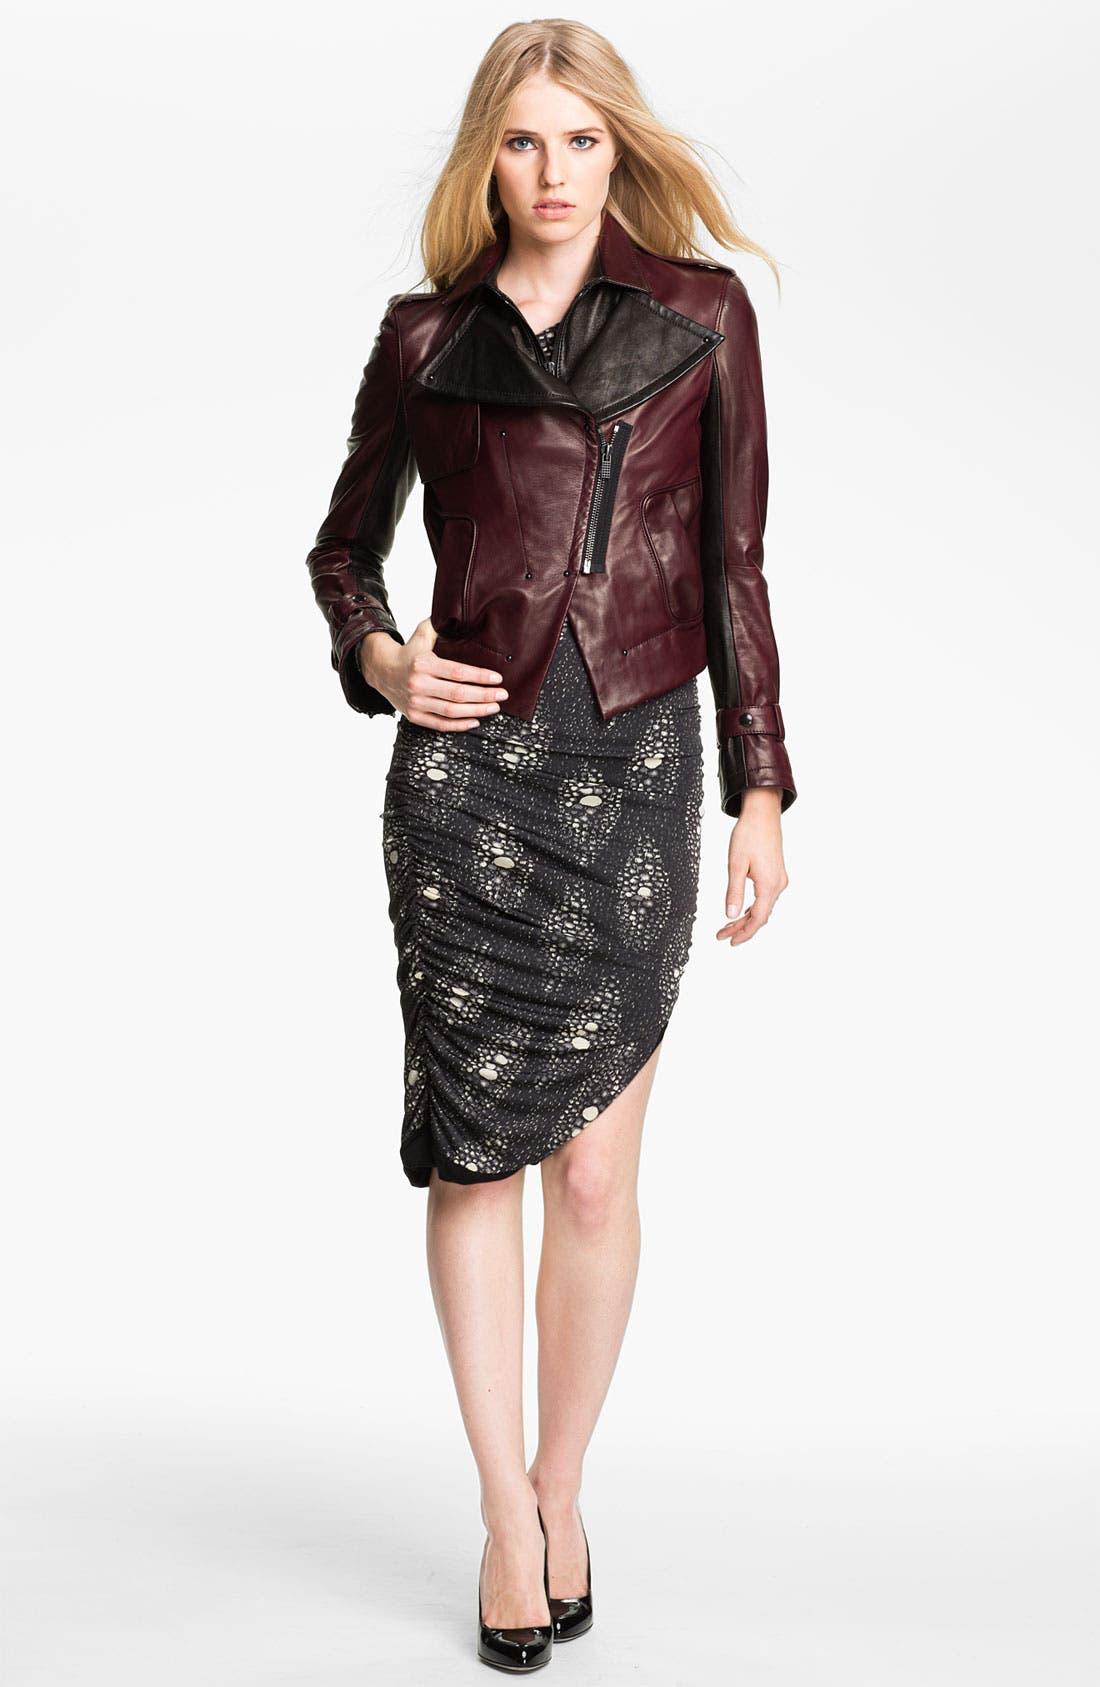 Alternate Image 1 Selected - Kelly Wearstler 'Triton' Asymmetrical Leather Jacket